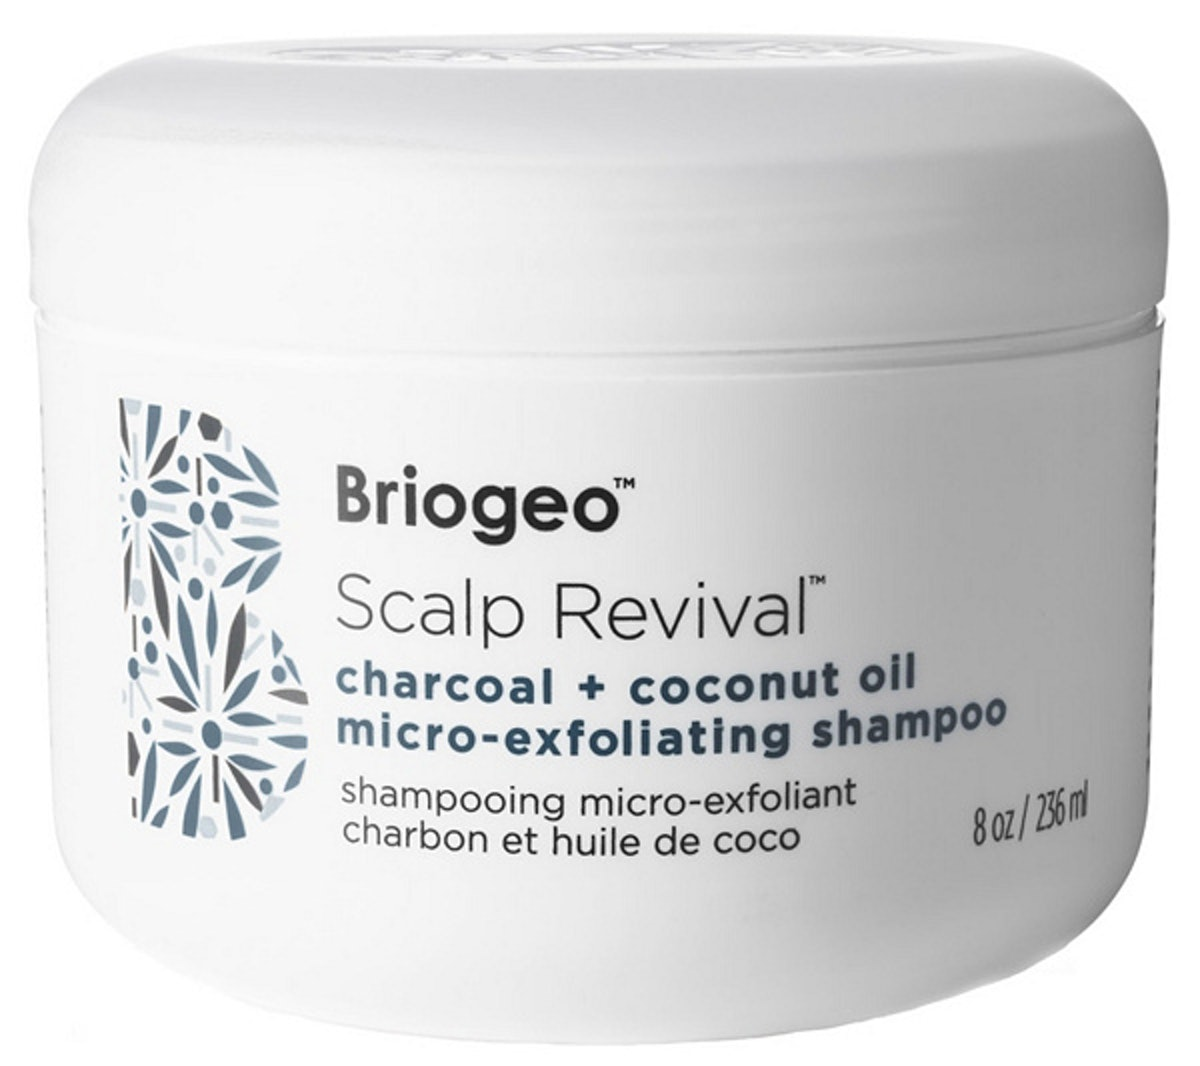 Scalp Revival Micro-Exfoliating Shampoo